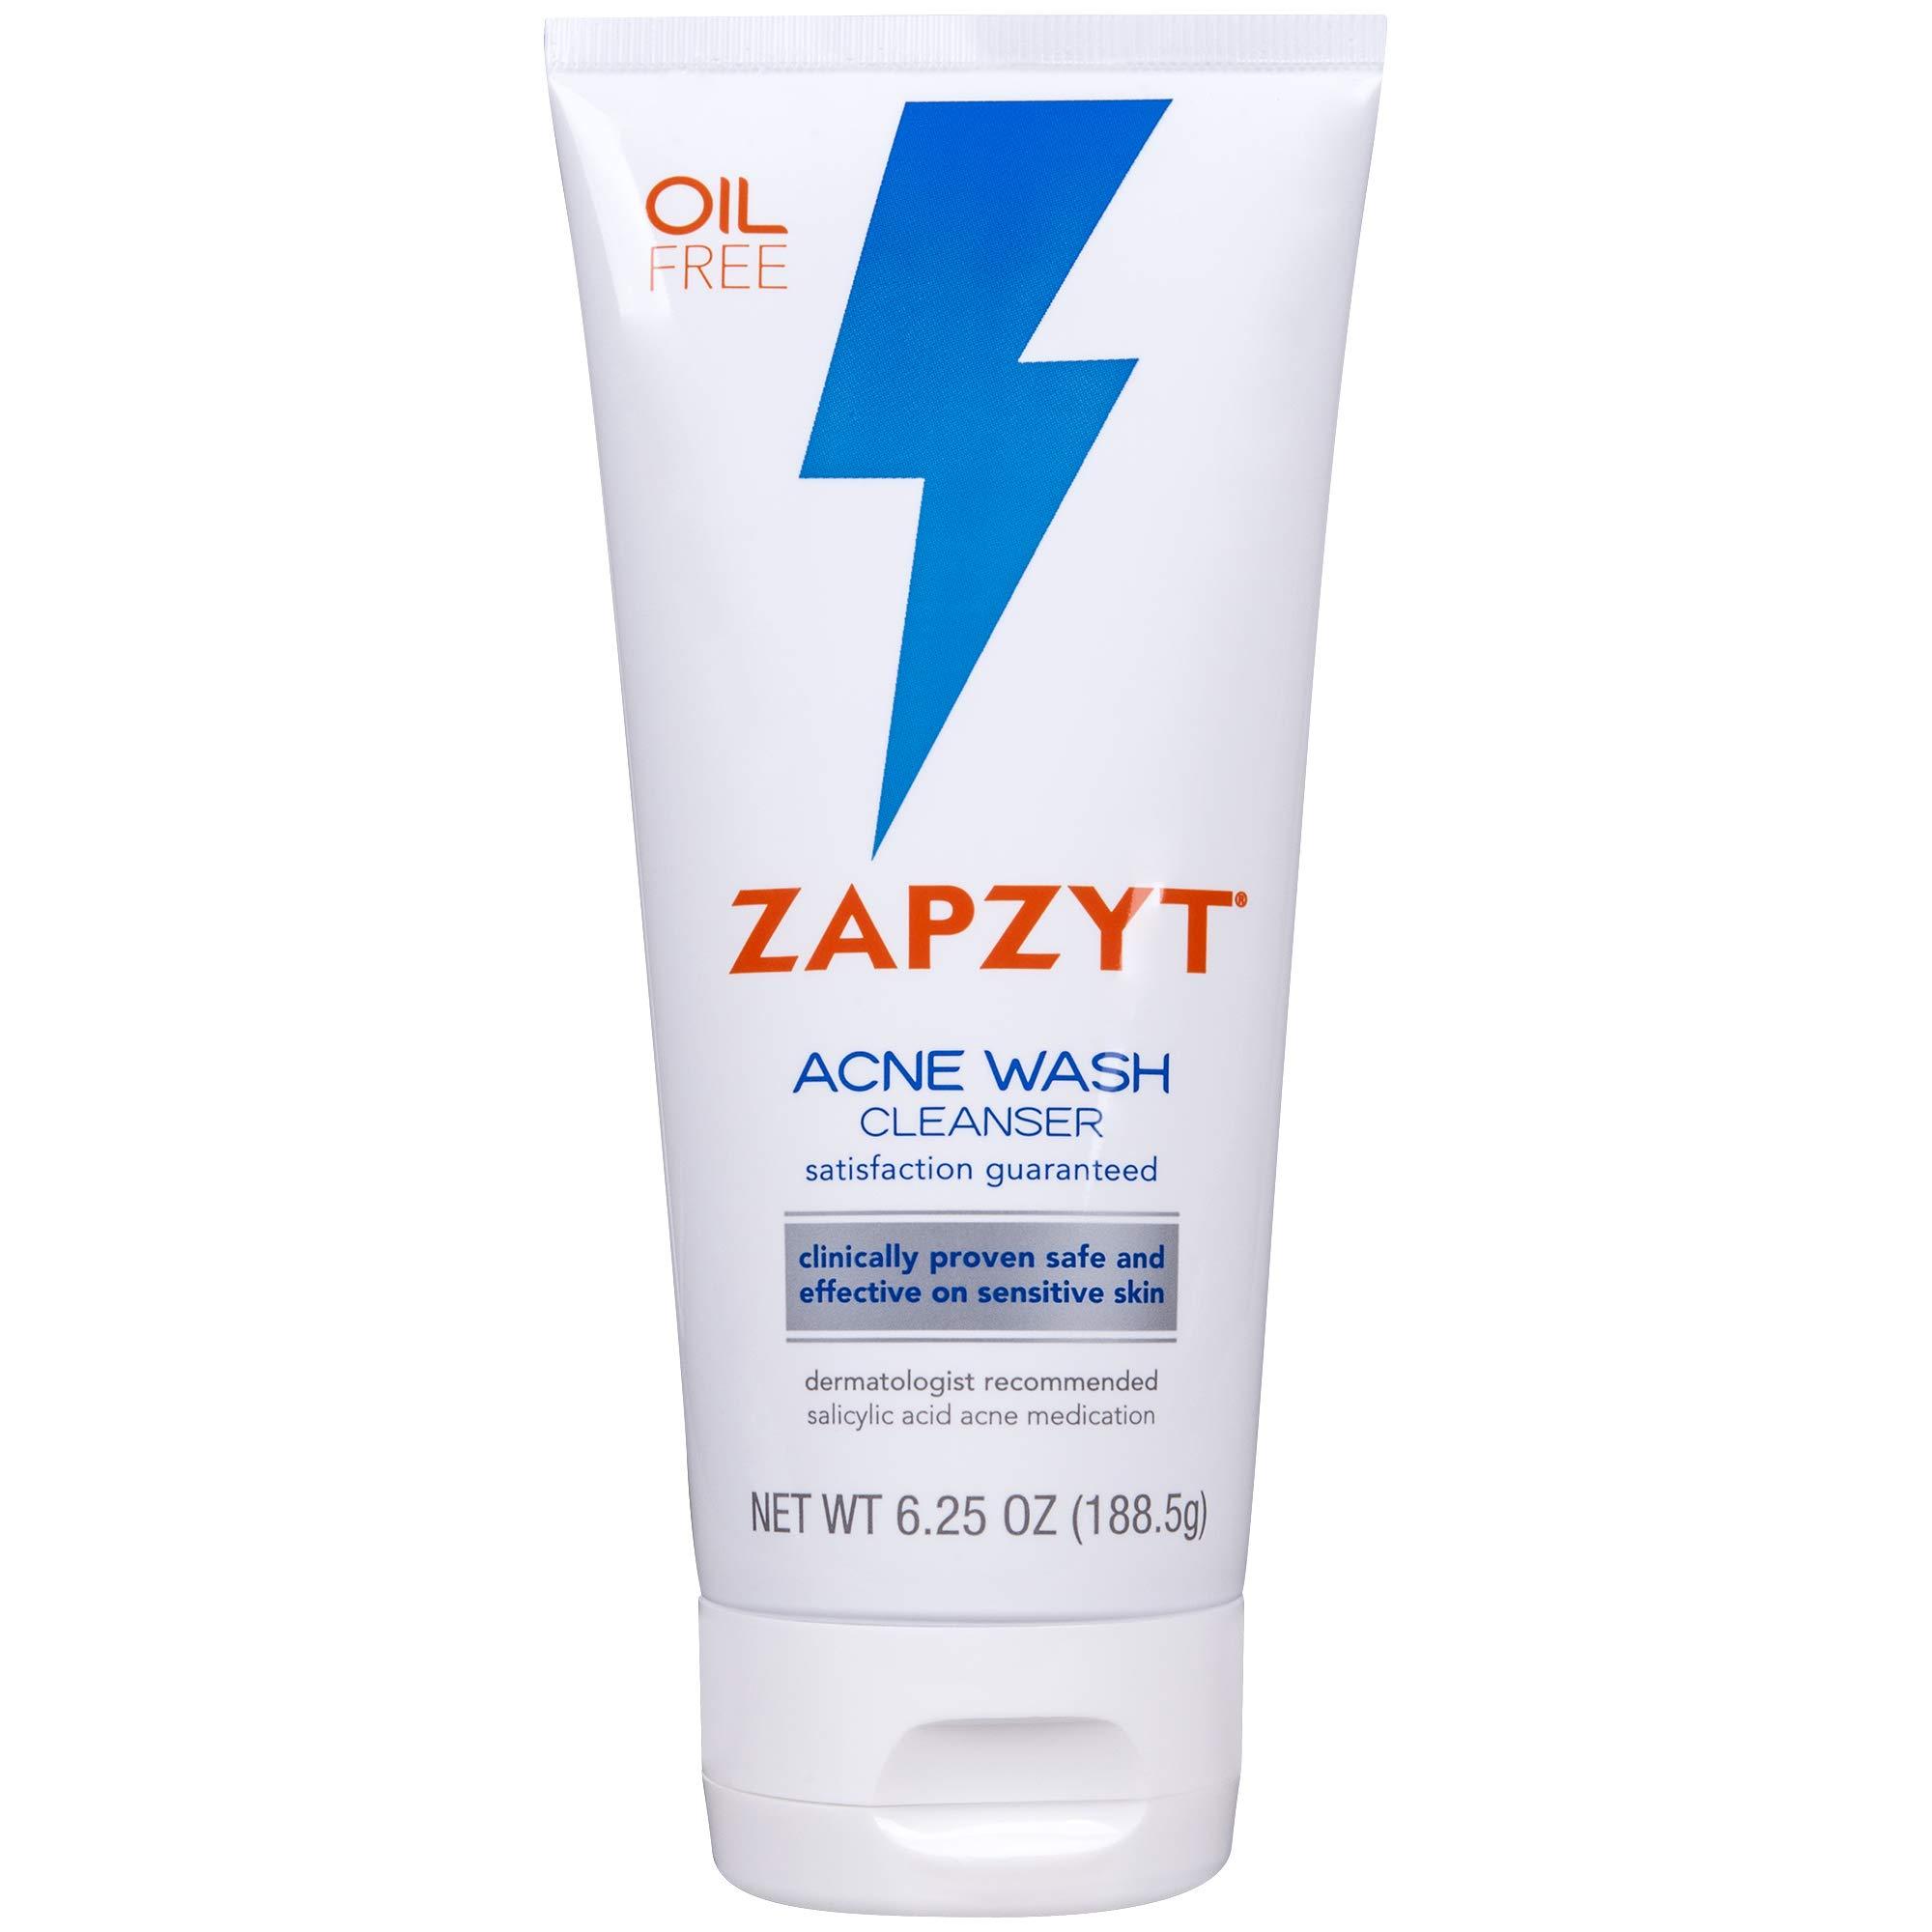 ZAPZYT Acne Wash Treatment For Face & Body - 6.25 oz